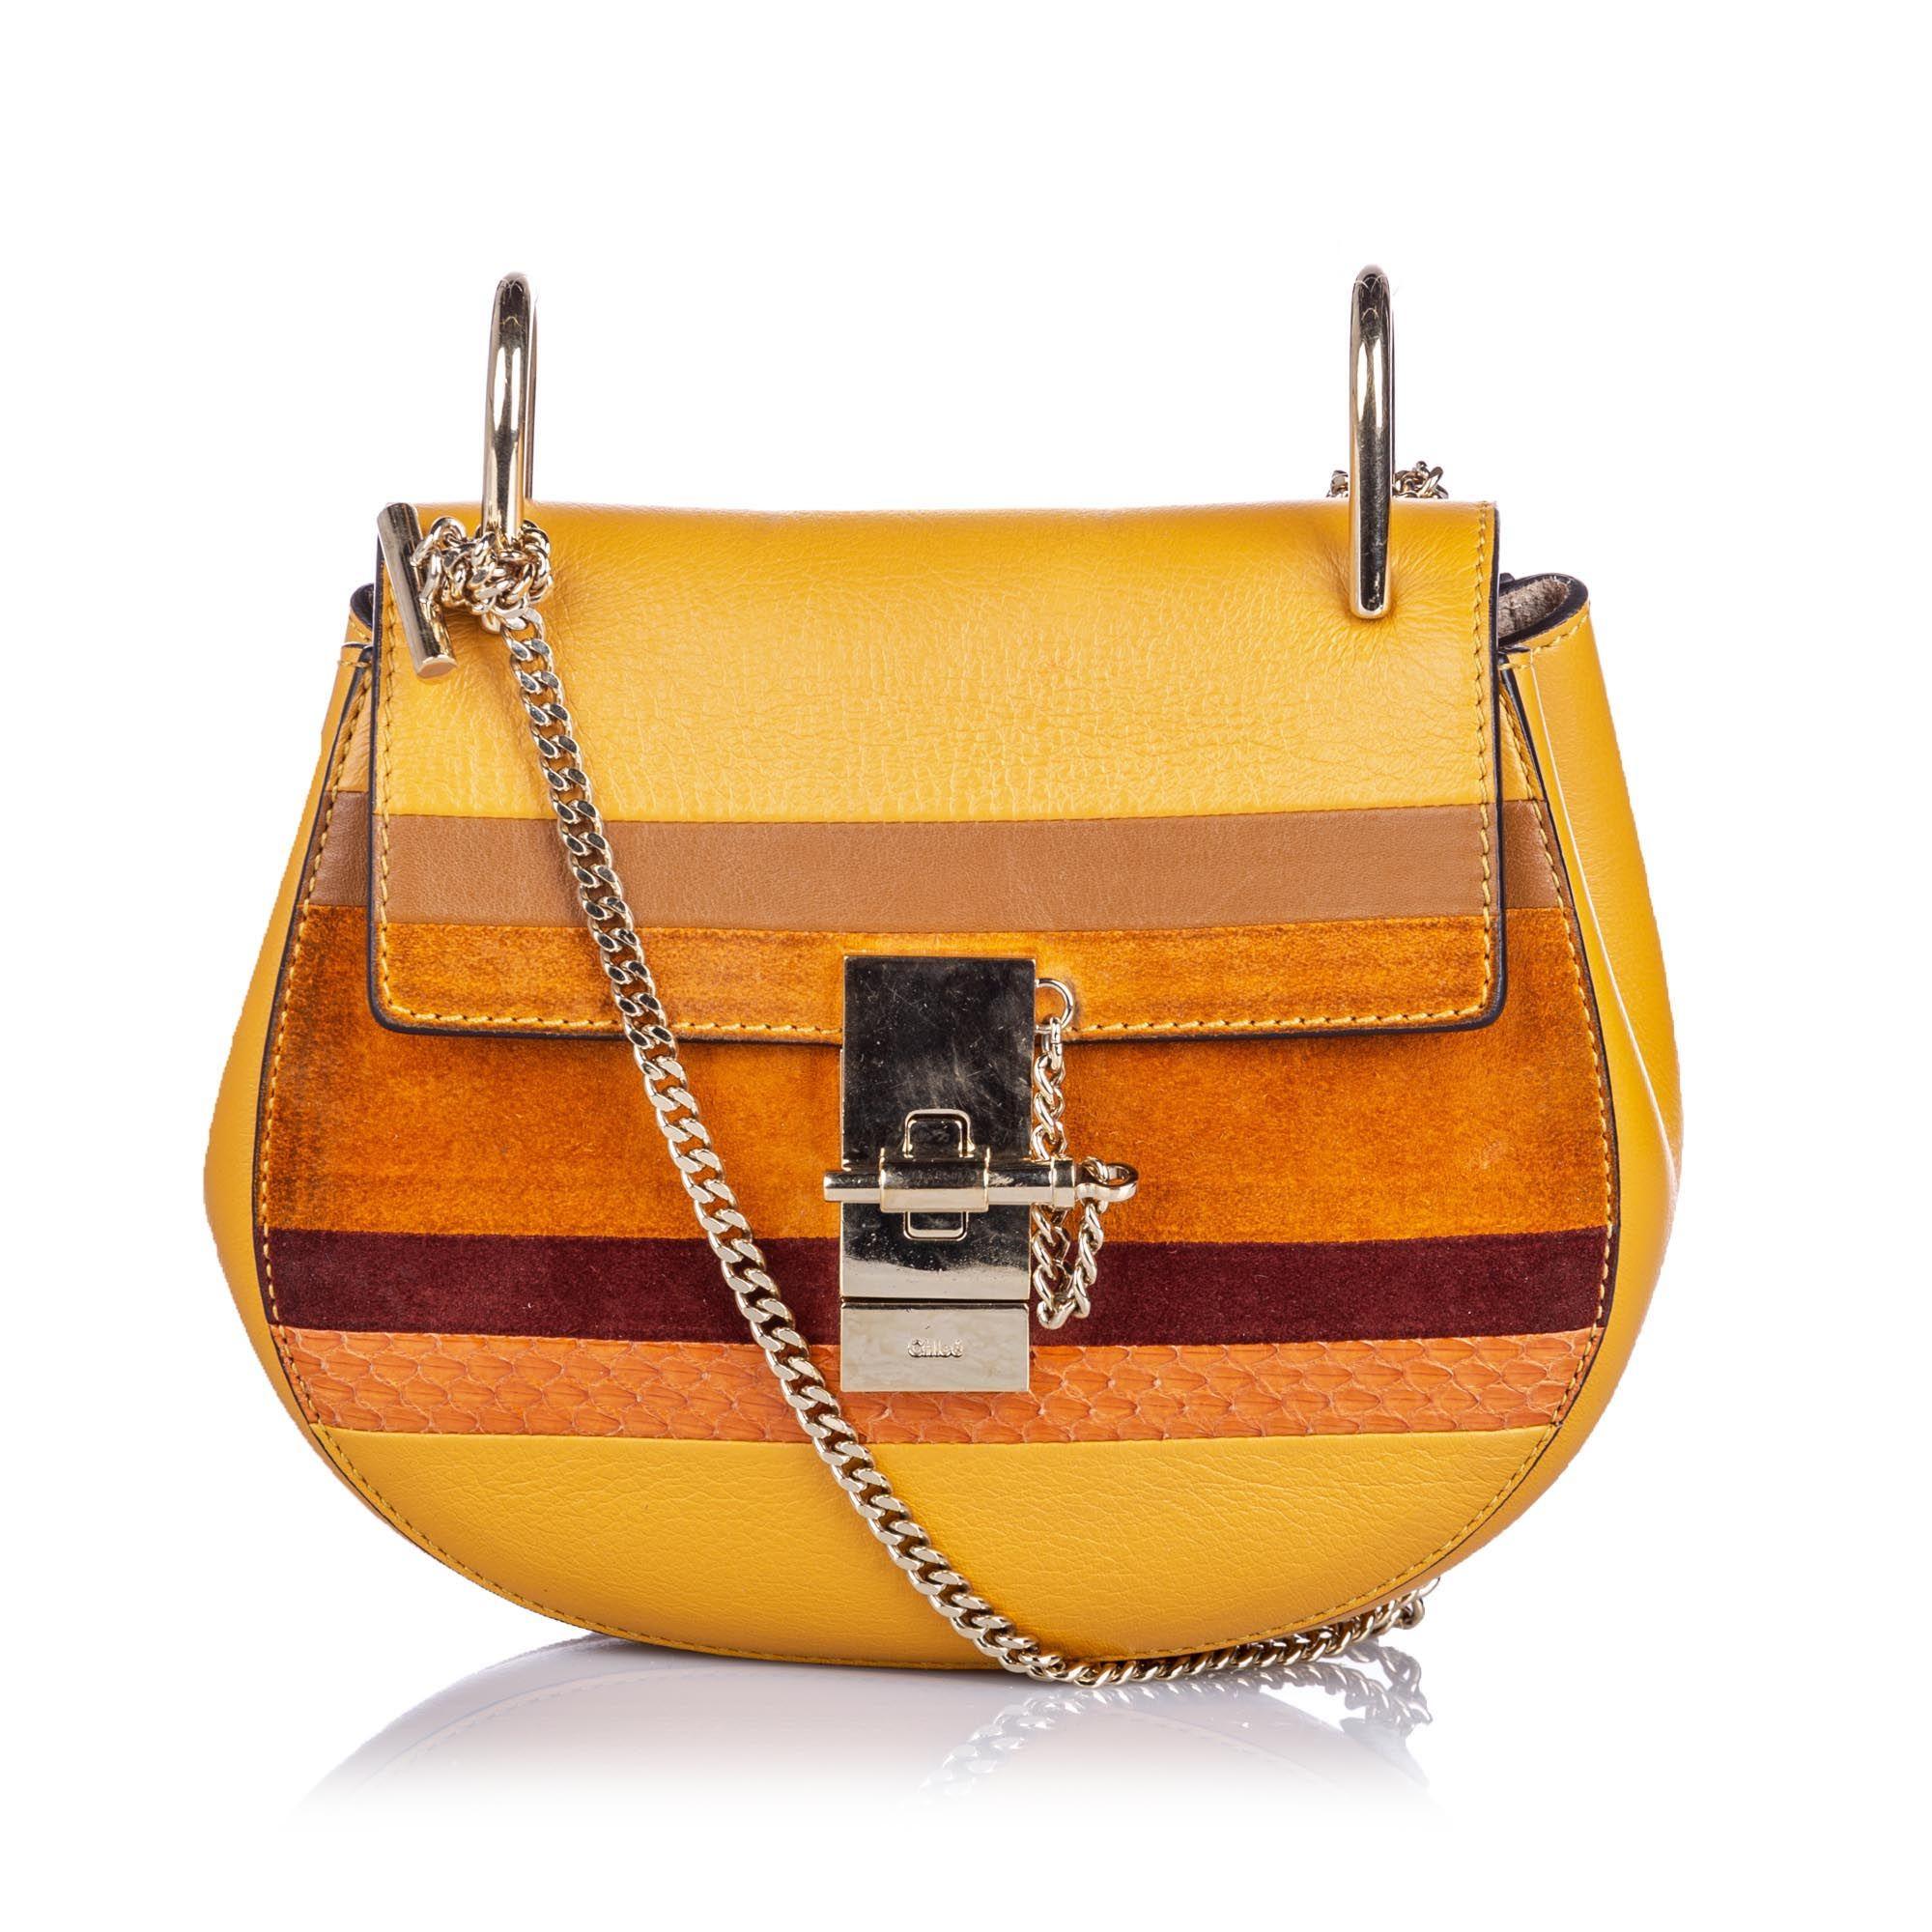 Vintage Chloe Patchwork Leather Drew Crossbody Bag Brown